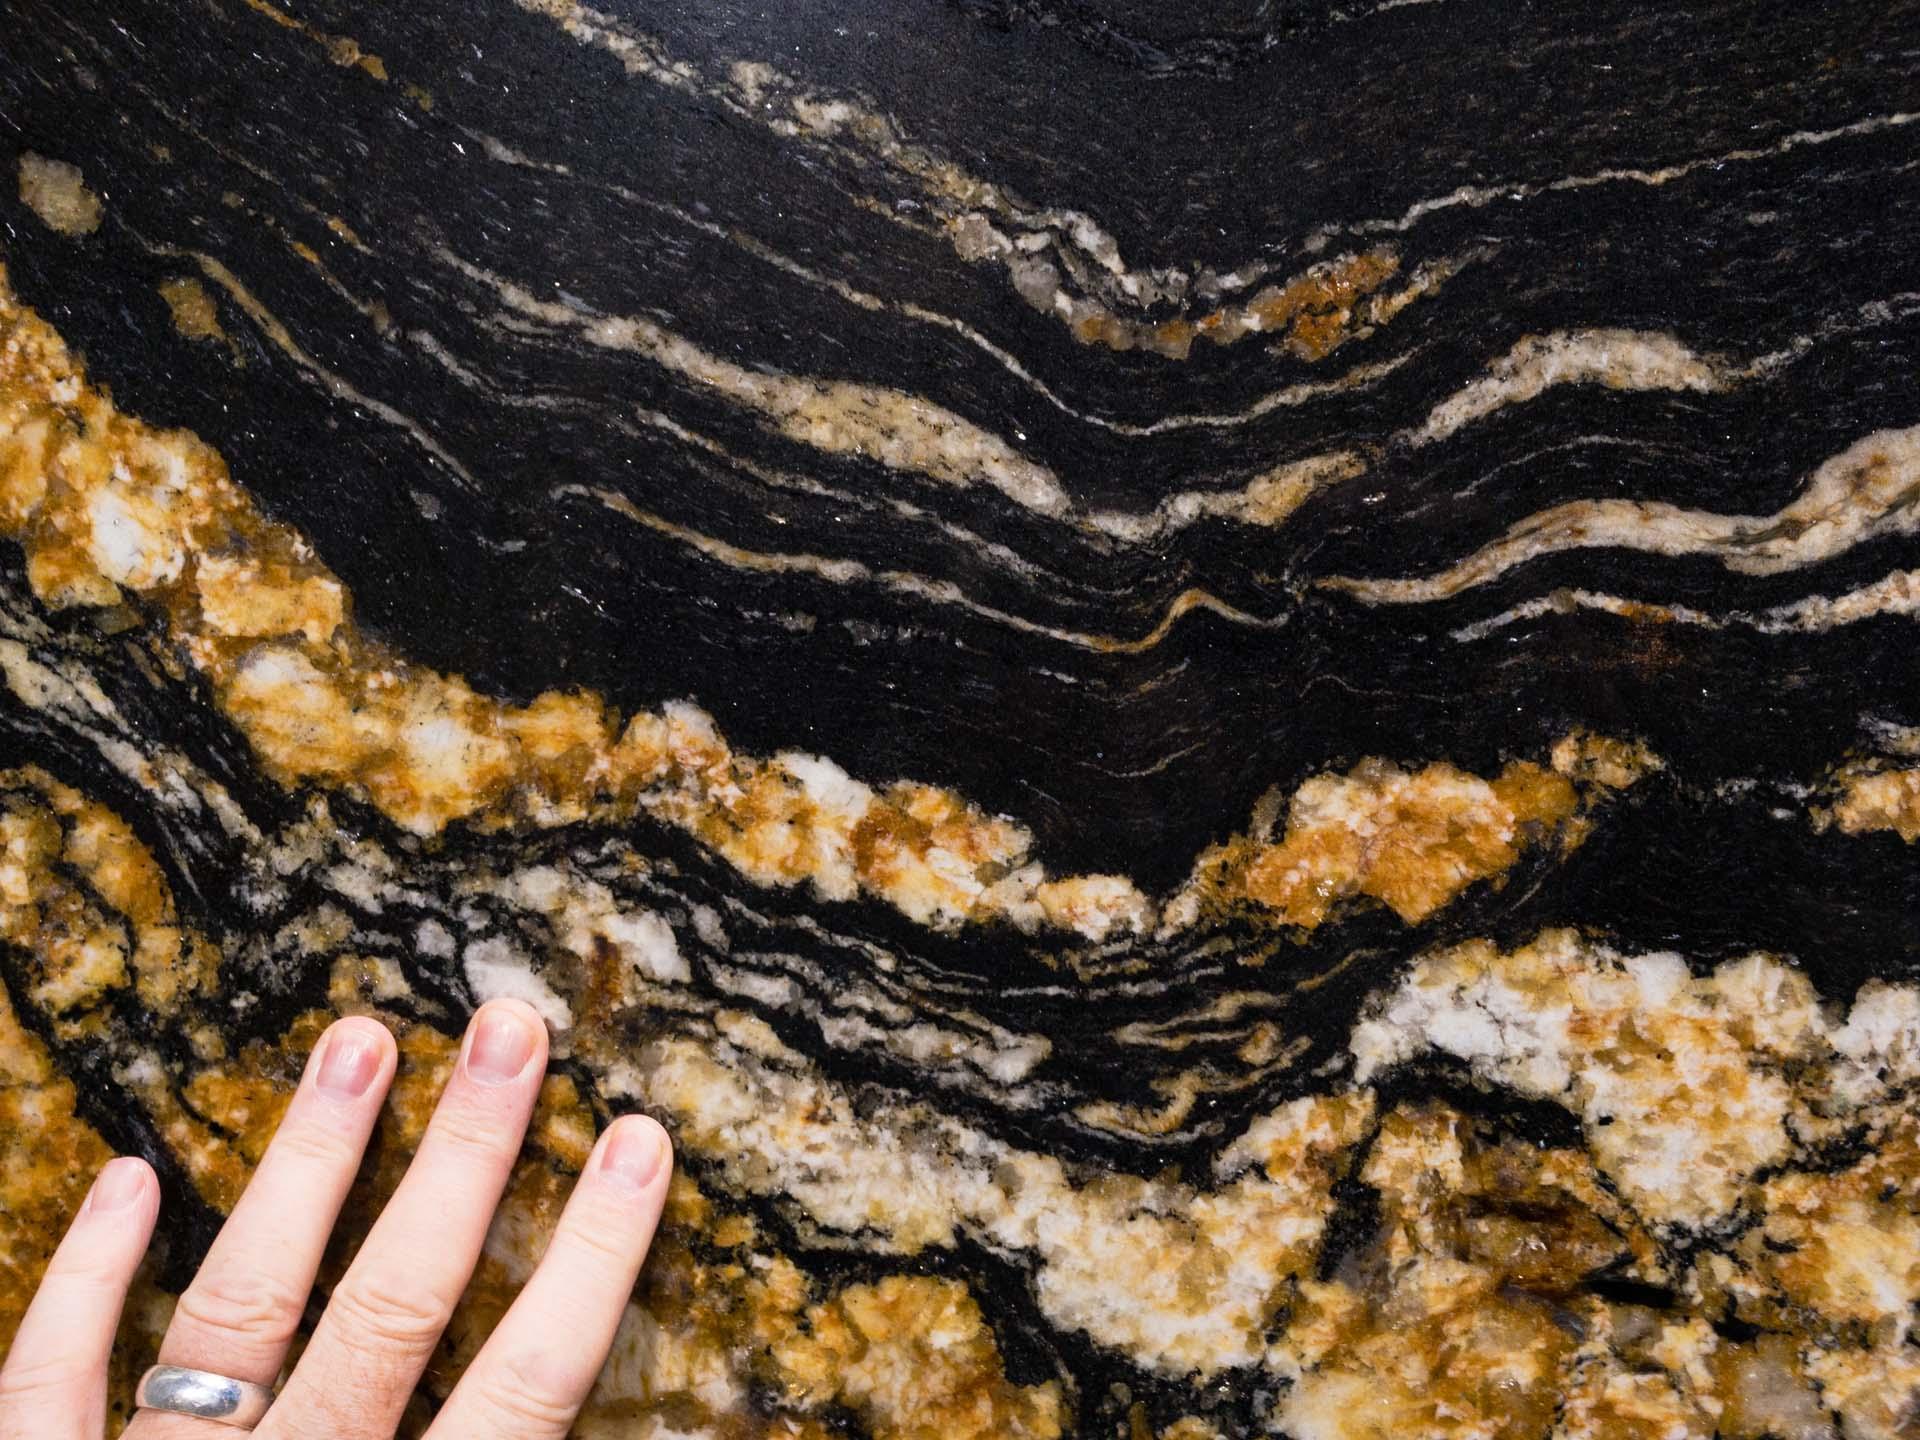 granite and quartz slabs Magma Black Granite GG181004 34093 154845-a